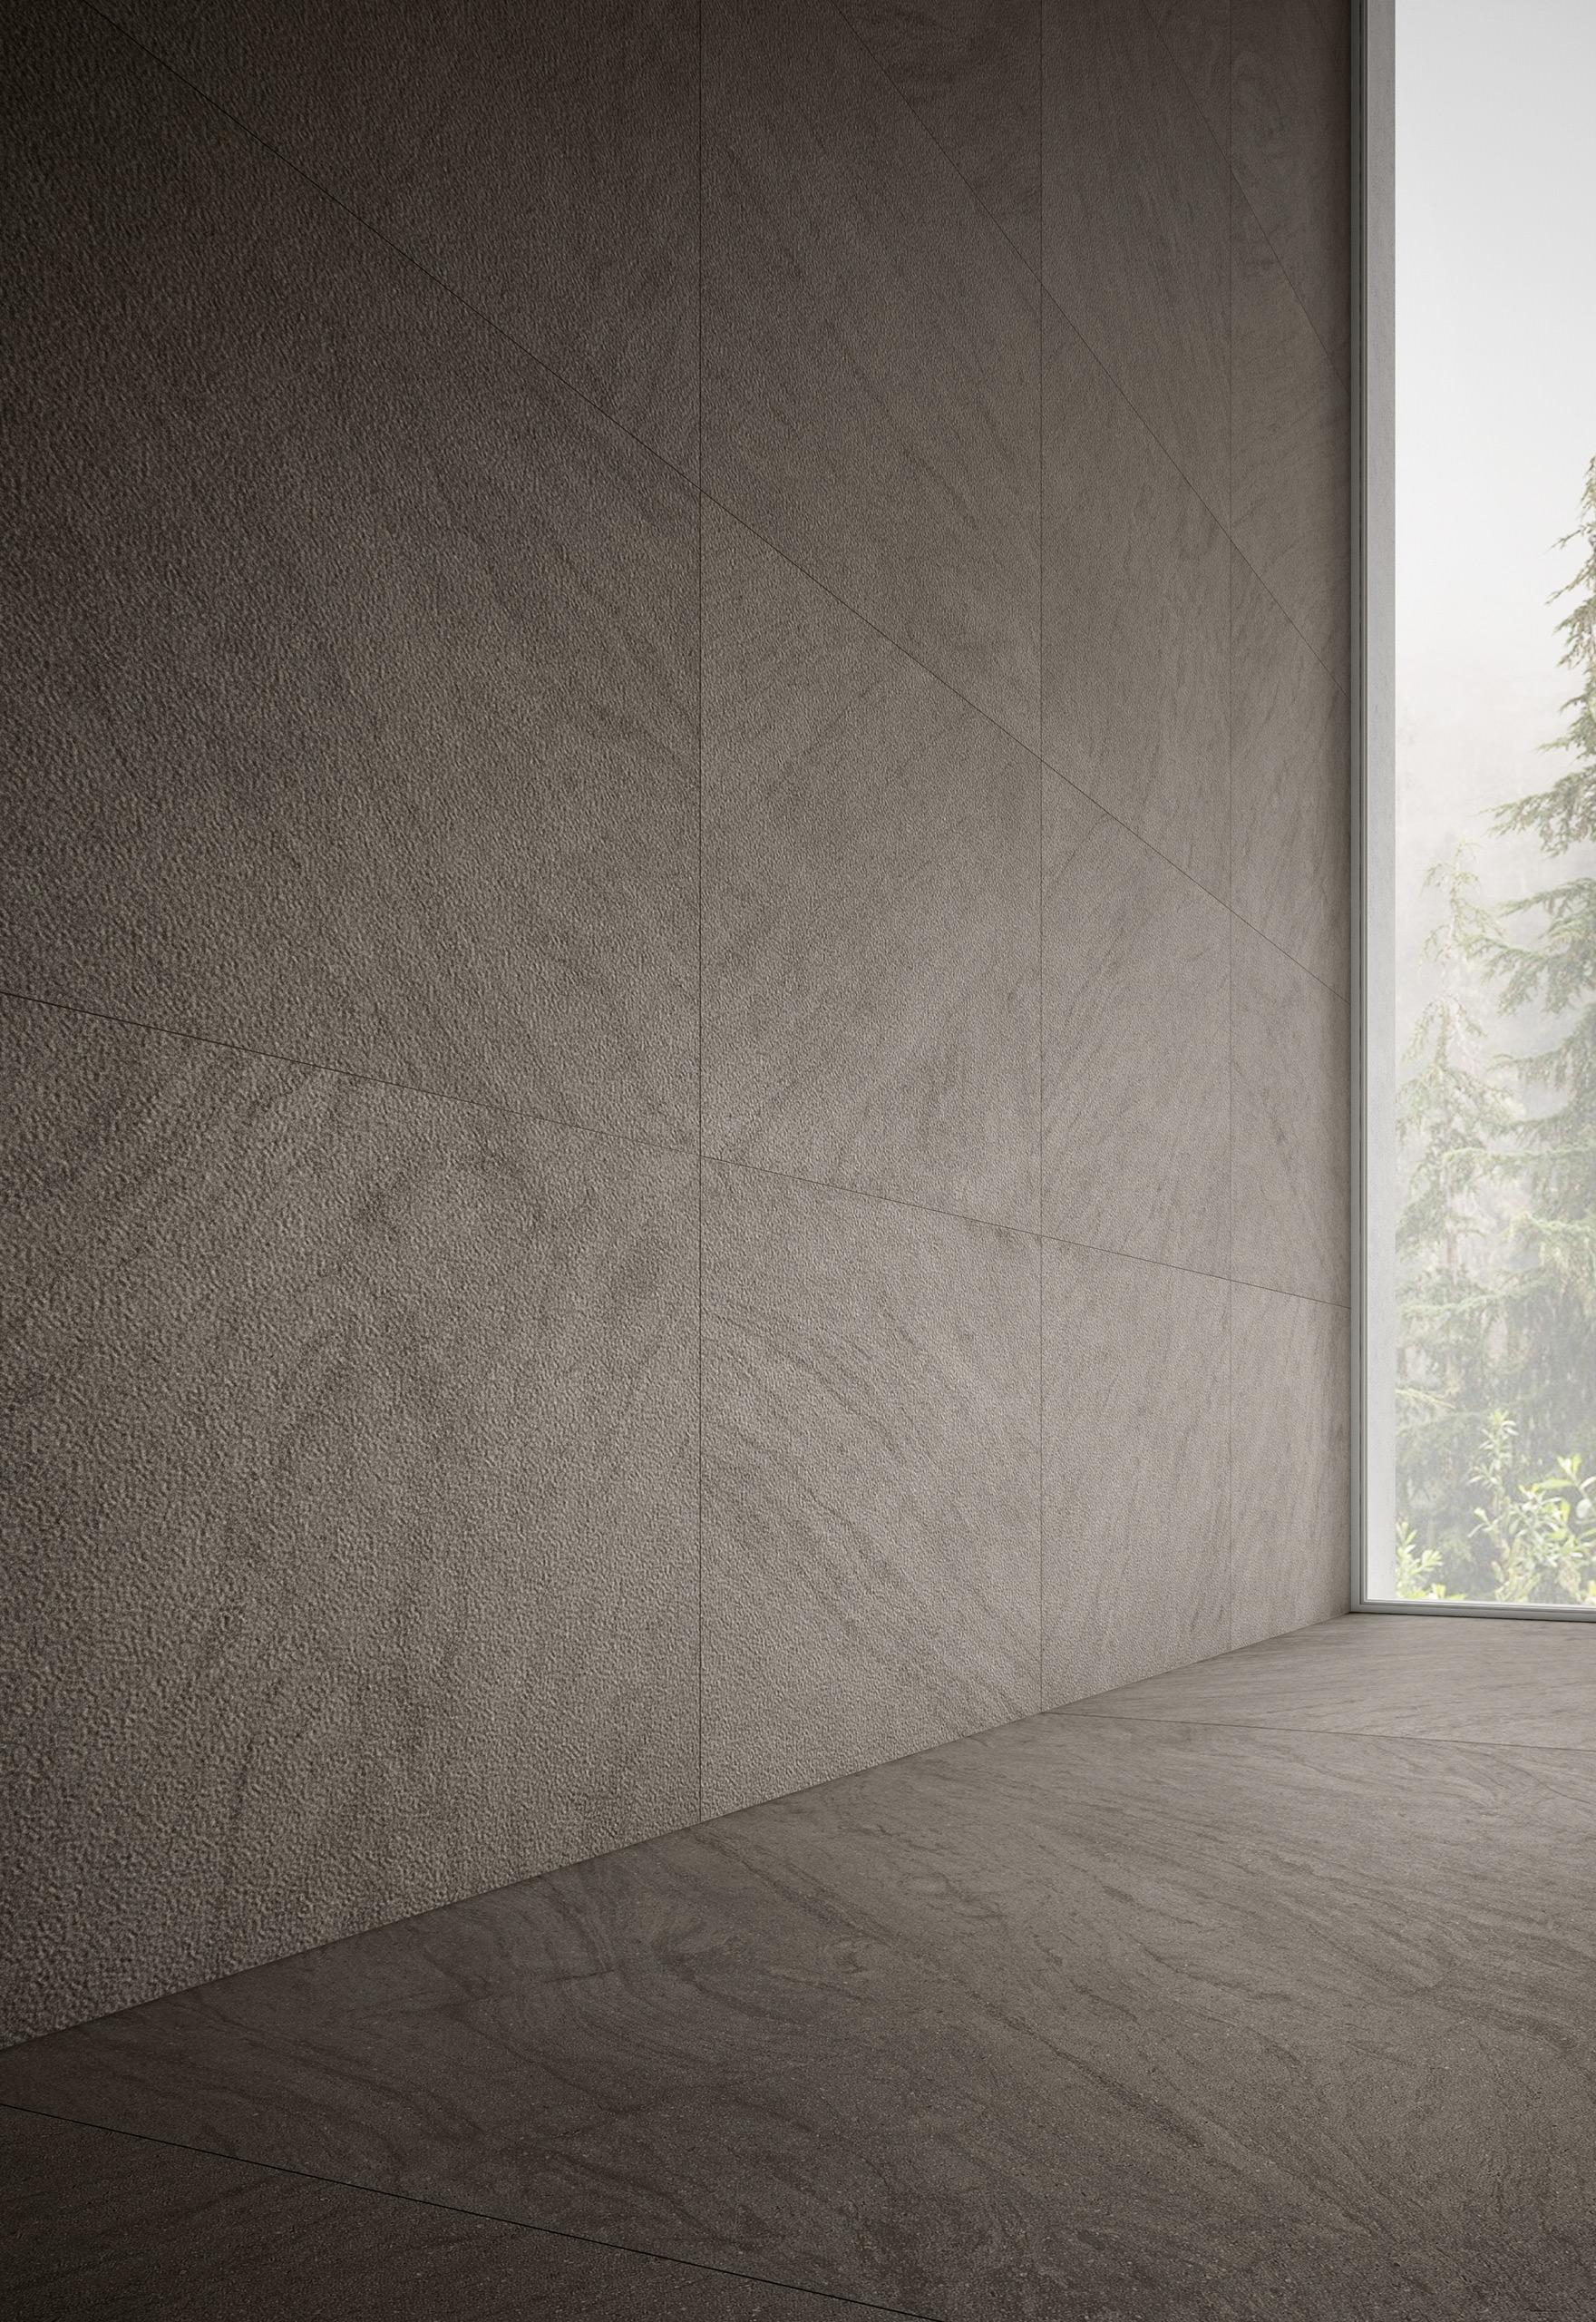 Rendering esterni interni fotorealistici Caesar living parete